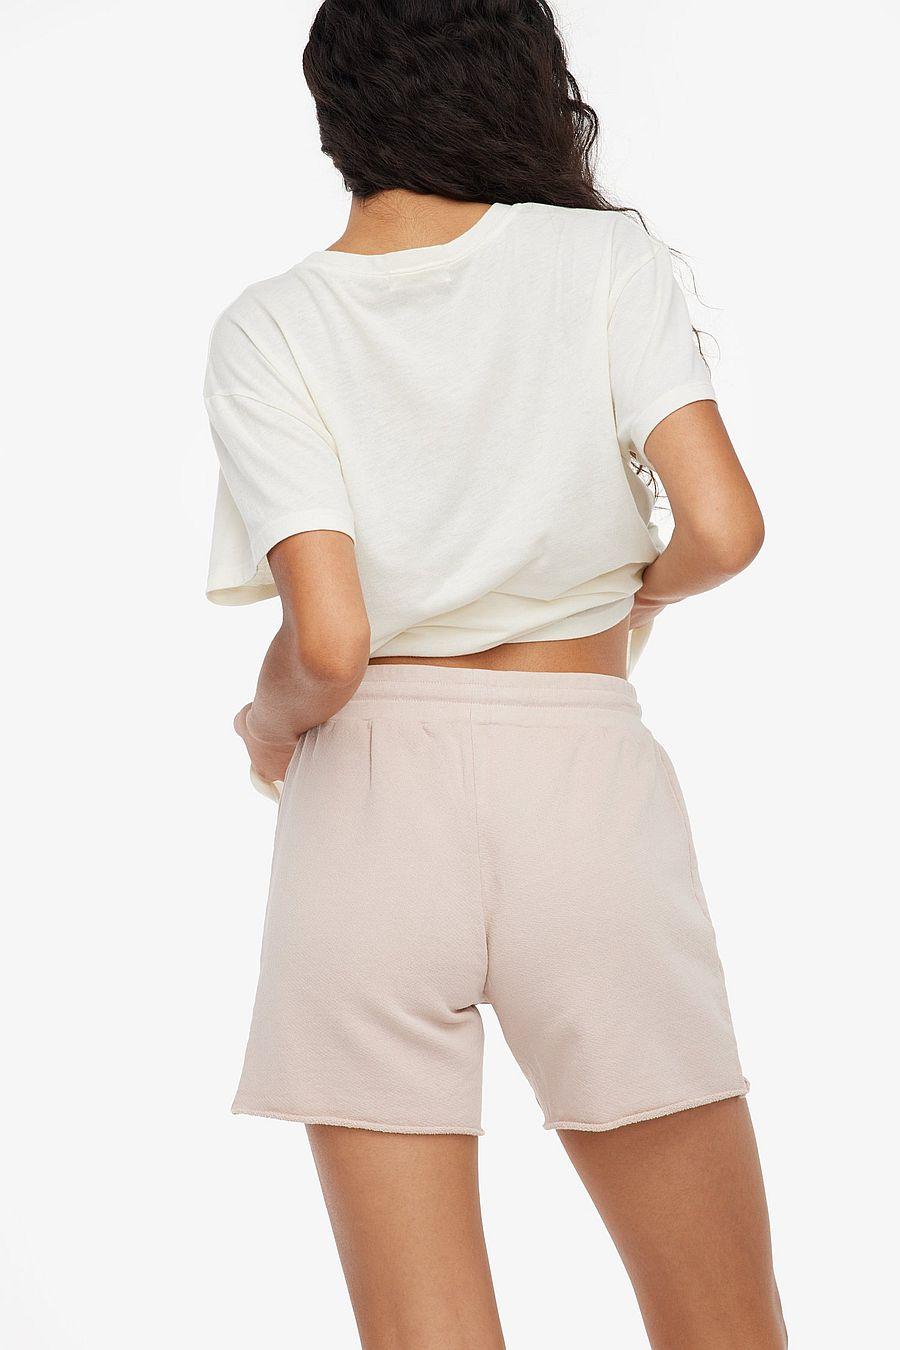 LACAUSA Clothing Slater Sweatshorts - Shroom